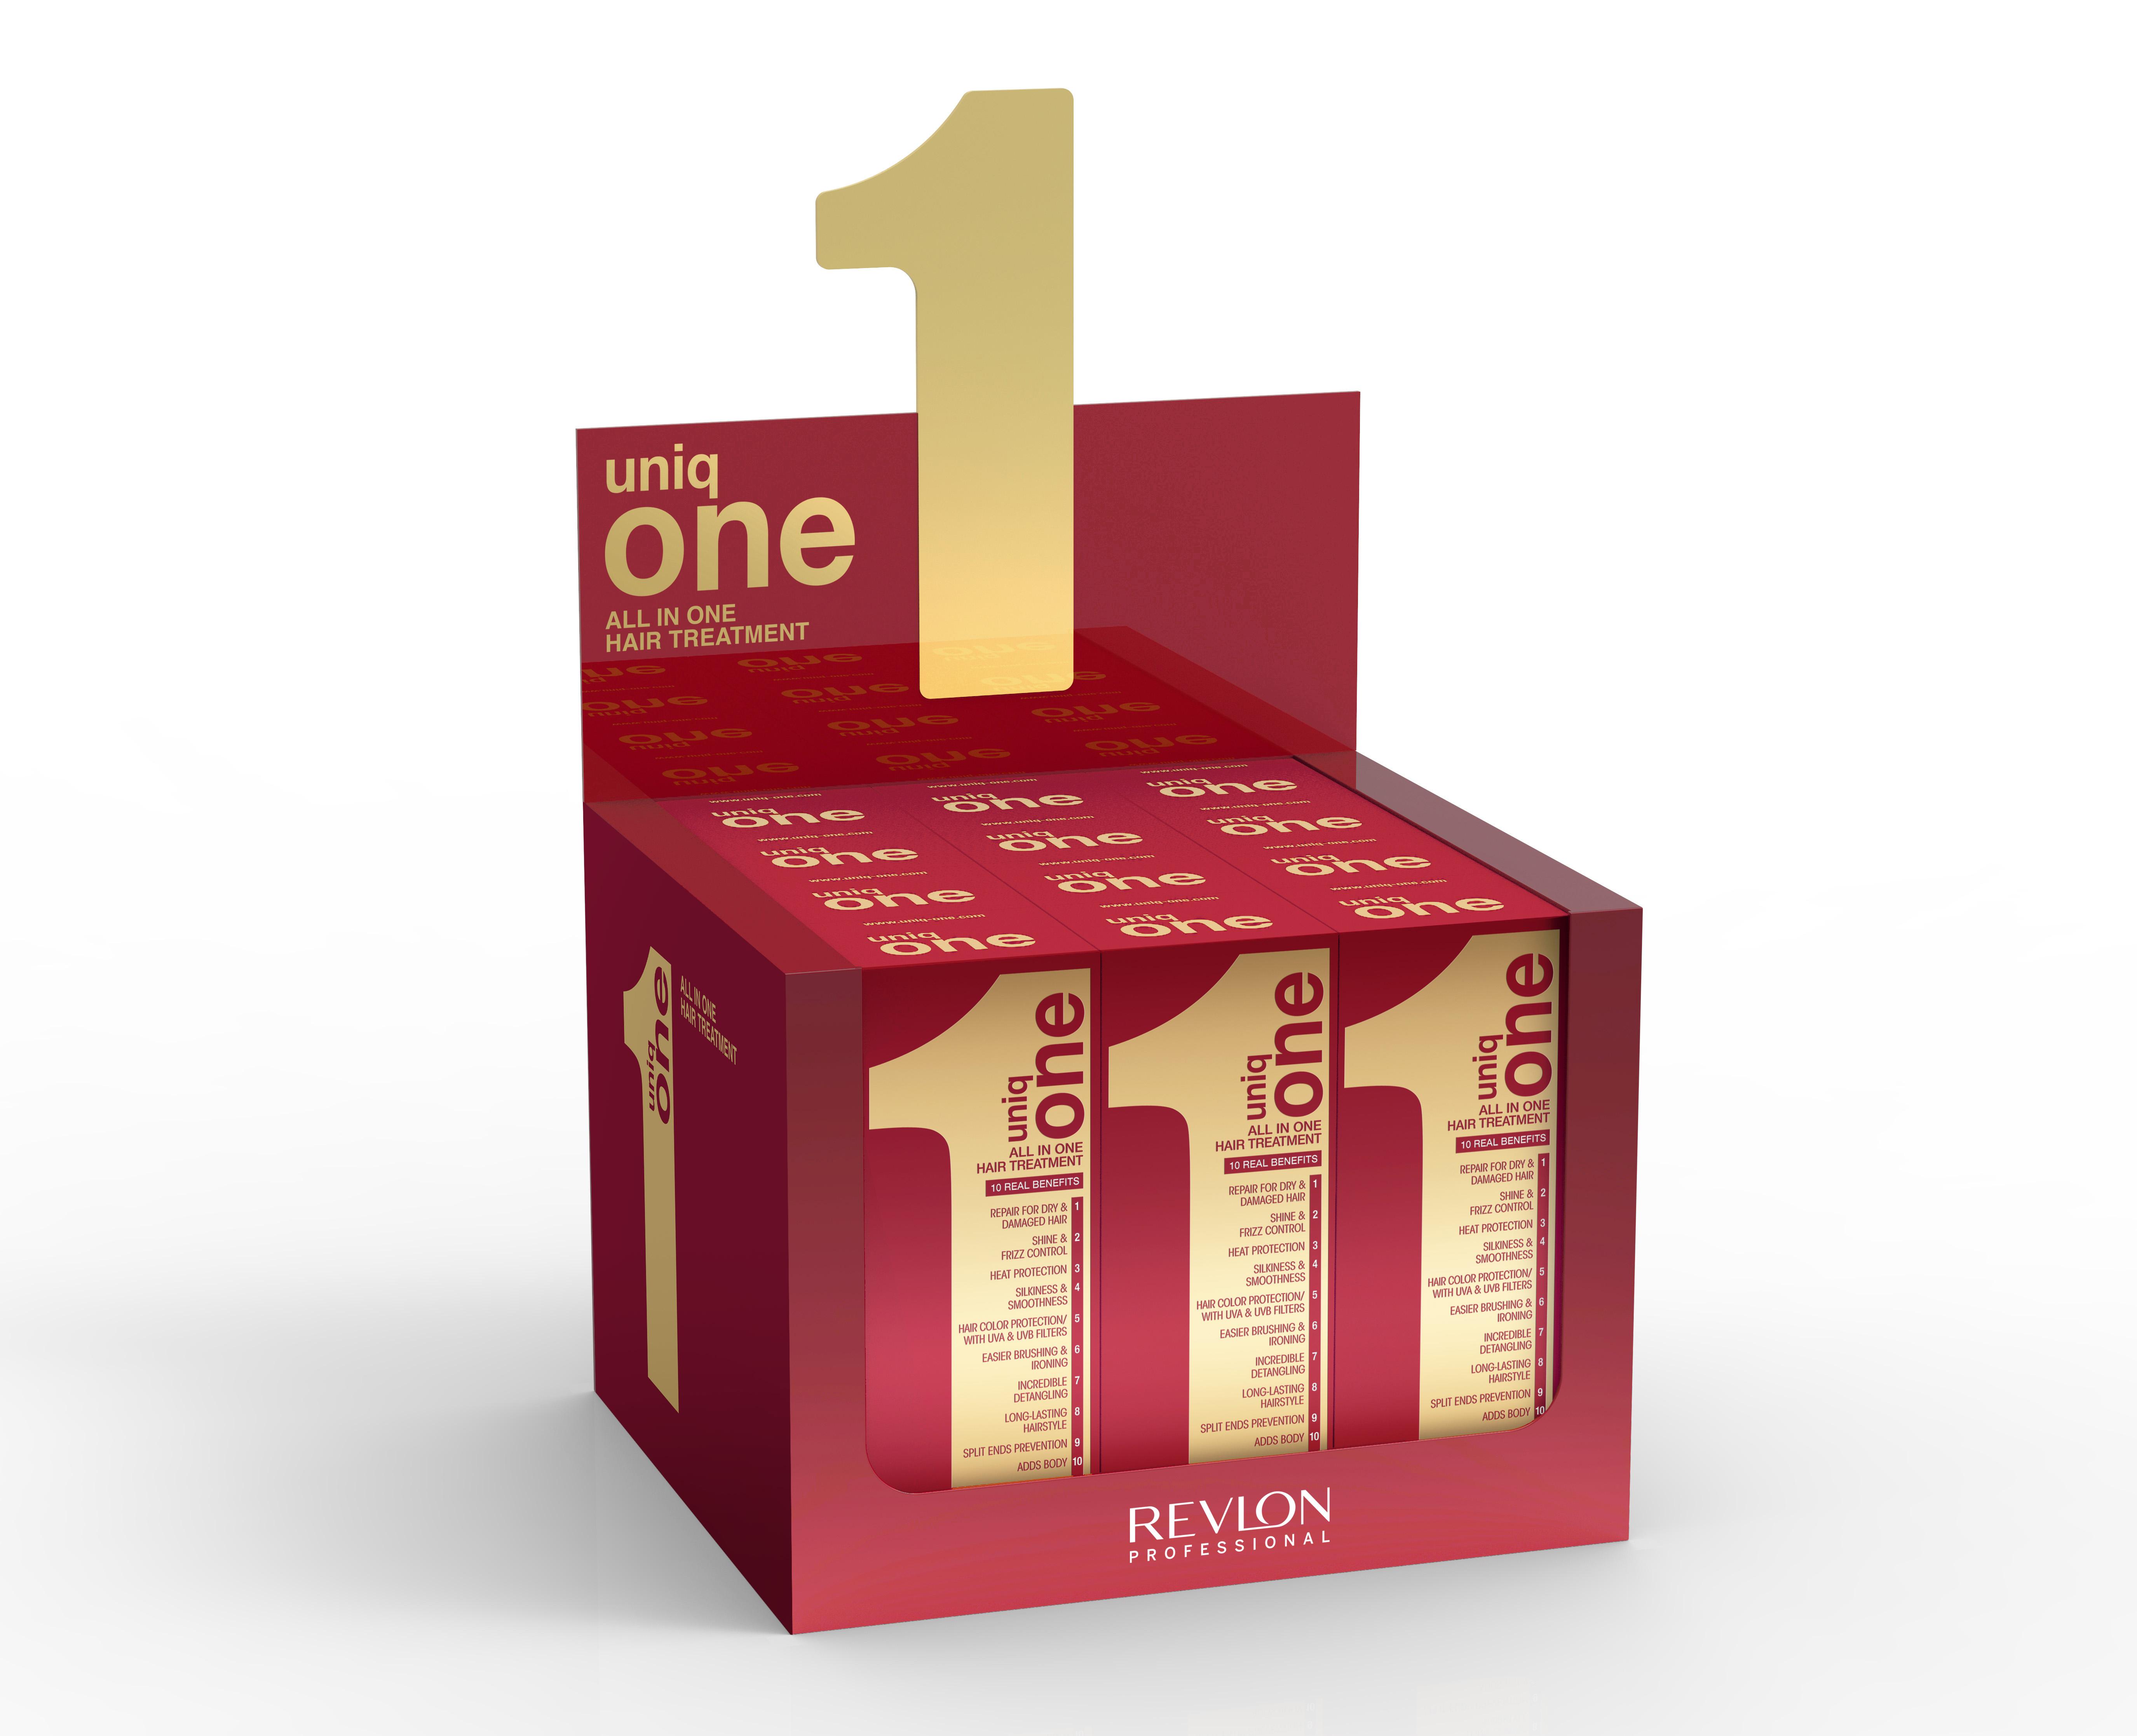 REVLON Professional Набор масок-спрей несмываемая / Uniq One 150 мл (1 коробка = 12 шт.)